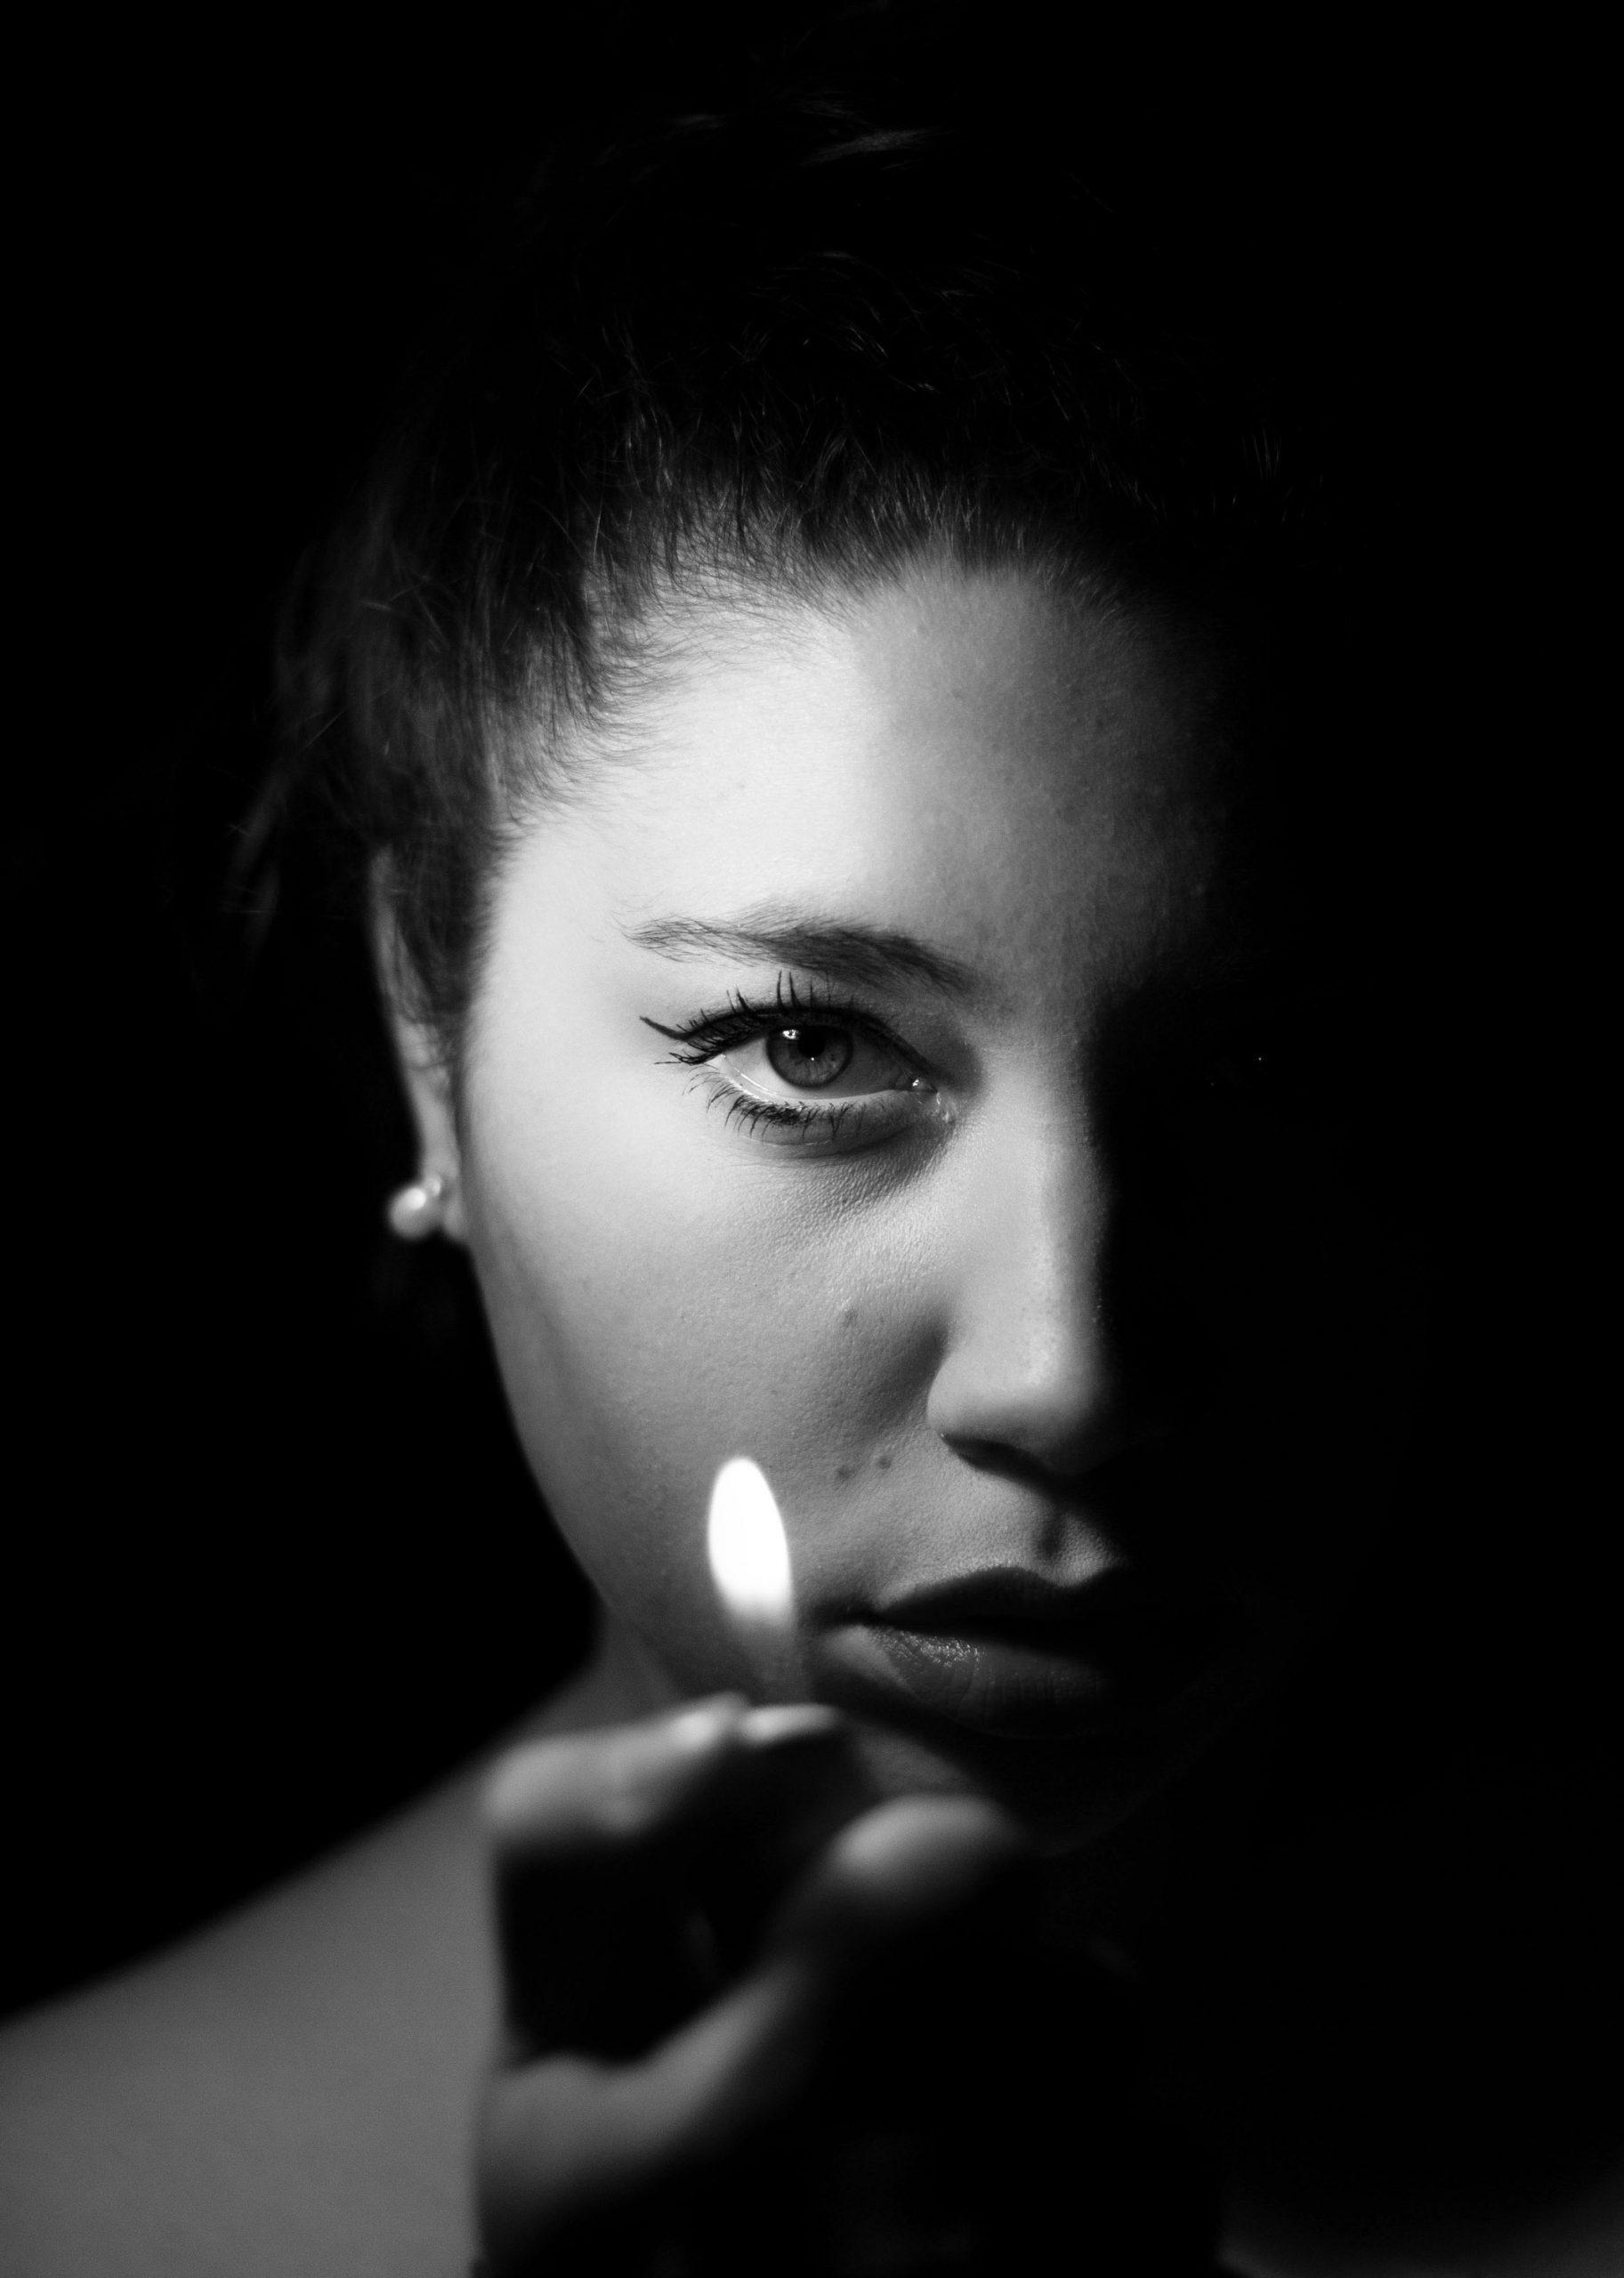 Categoria: Glamour, Portrait; Photographer & Model: FRANCESCA CASARO; Location: Padova, PD, Italia